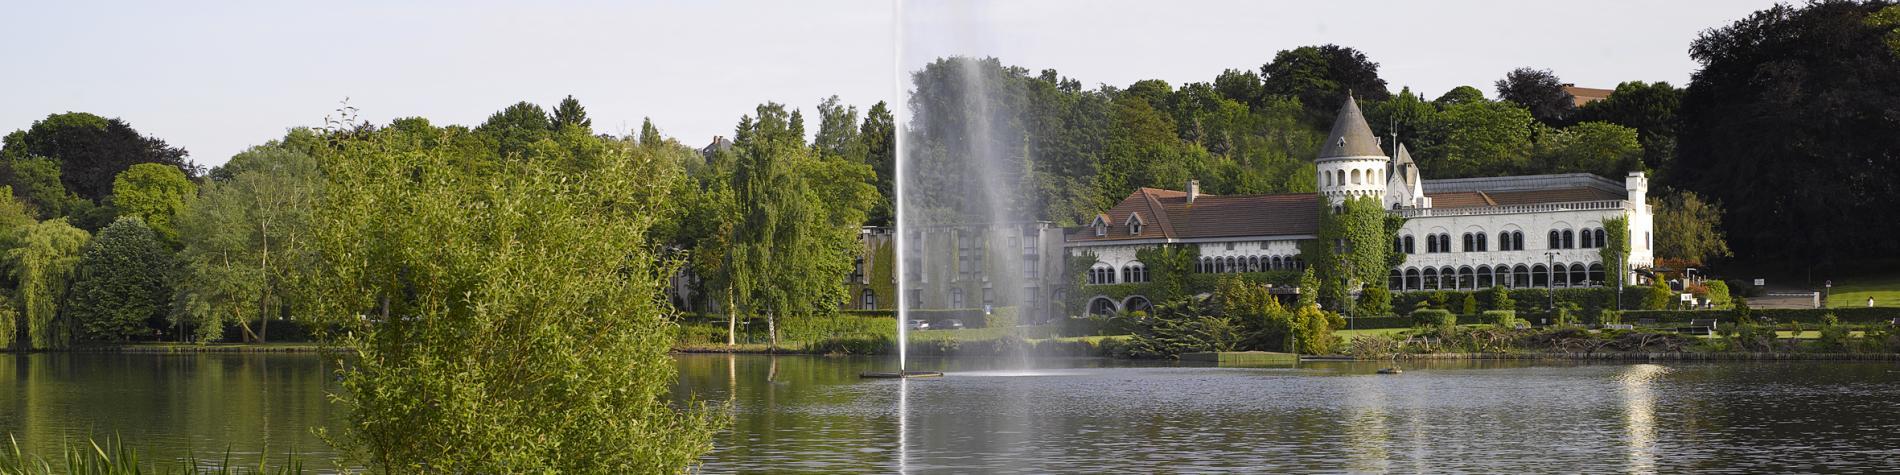 Hotel- Martin's Chateau du Lac - Genval